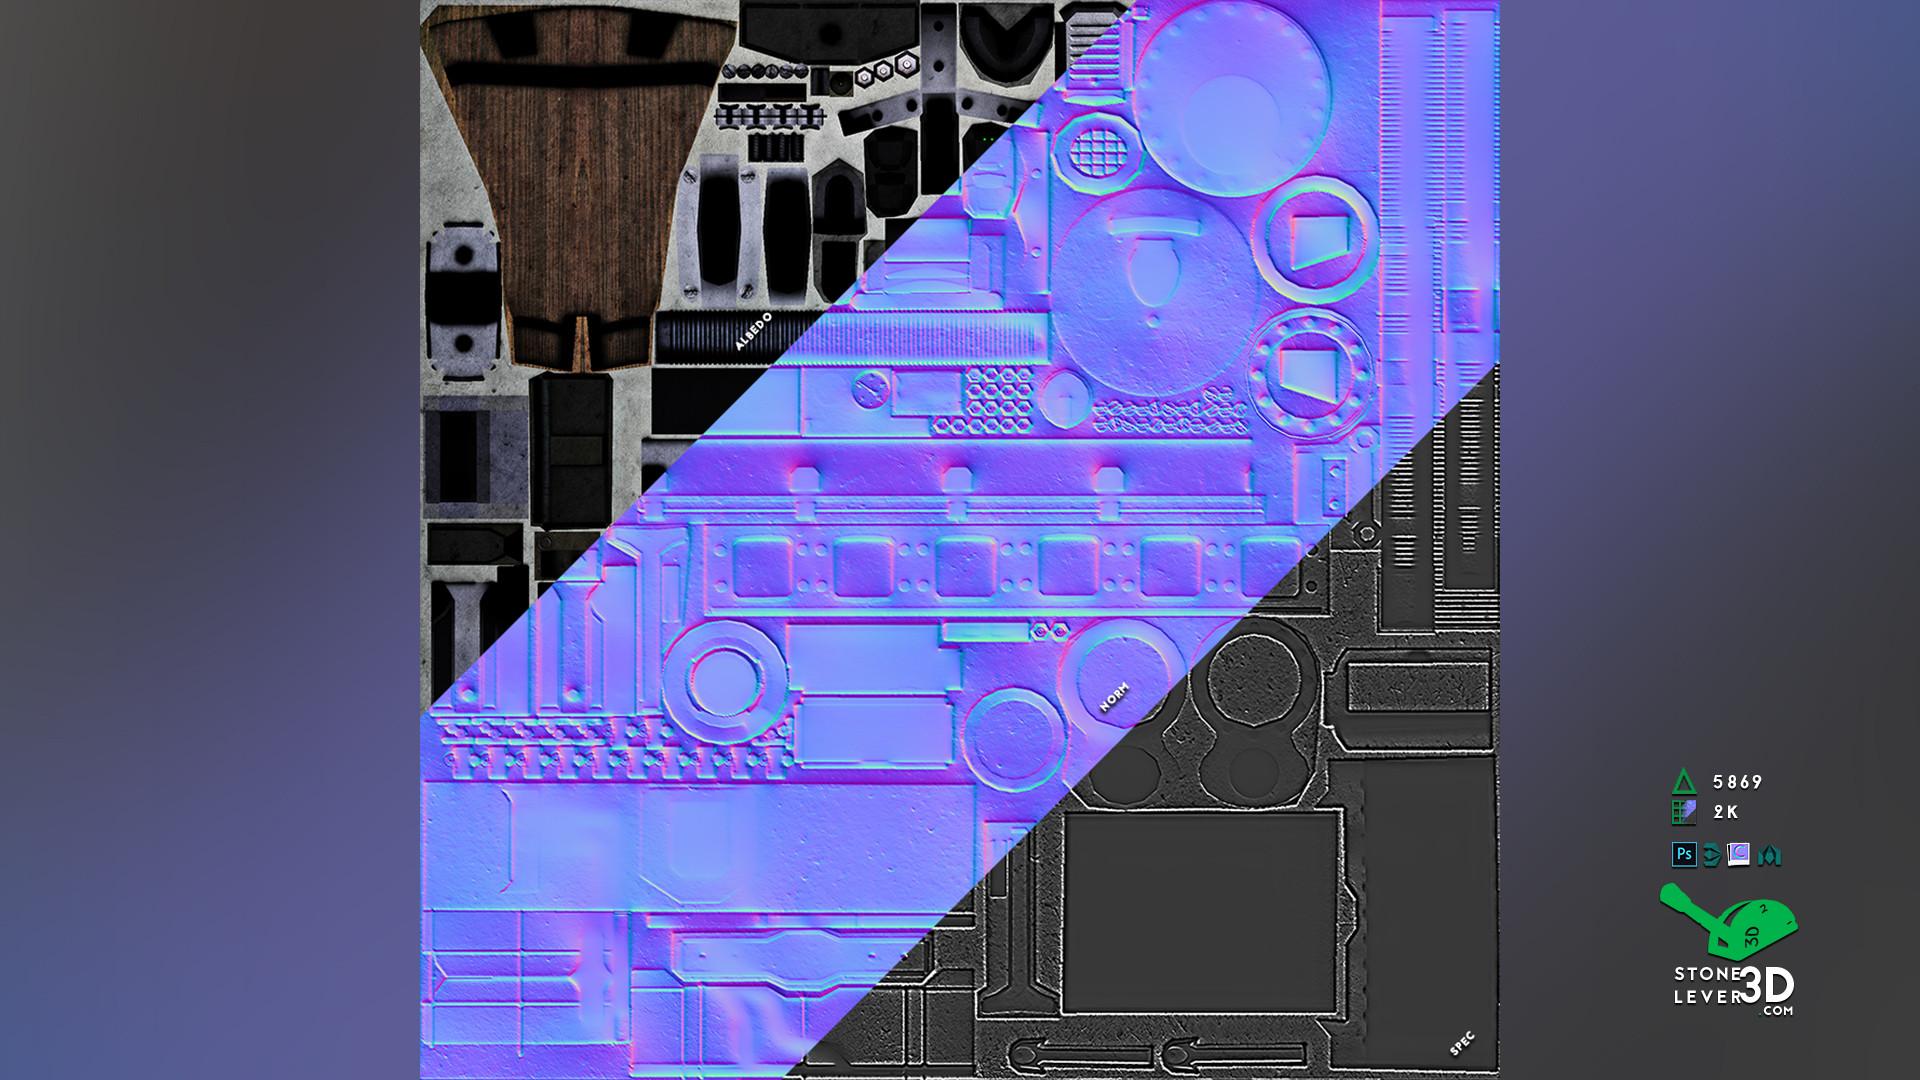 """Railway Rifle"" Weapon Prop Model Replica - Texture Sheet"